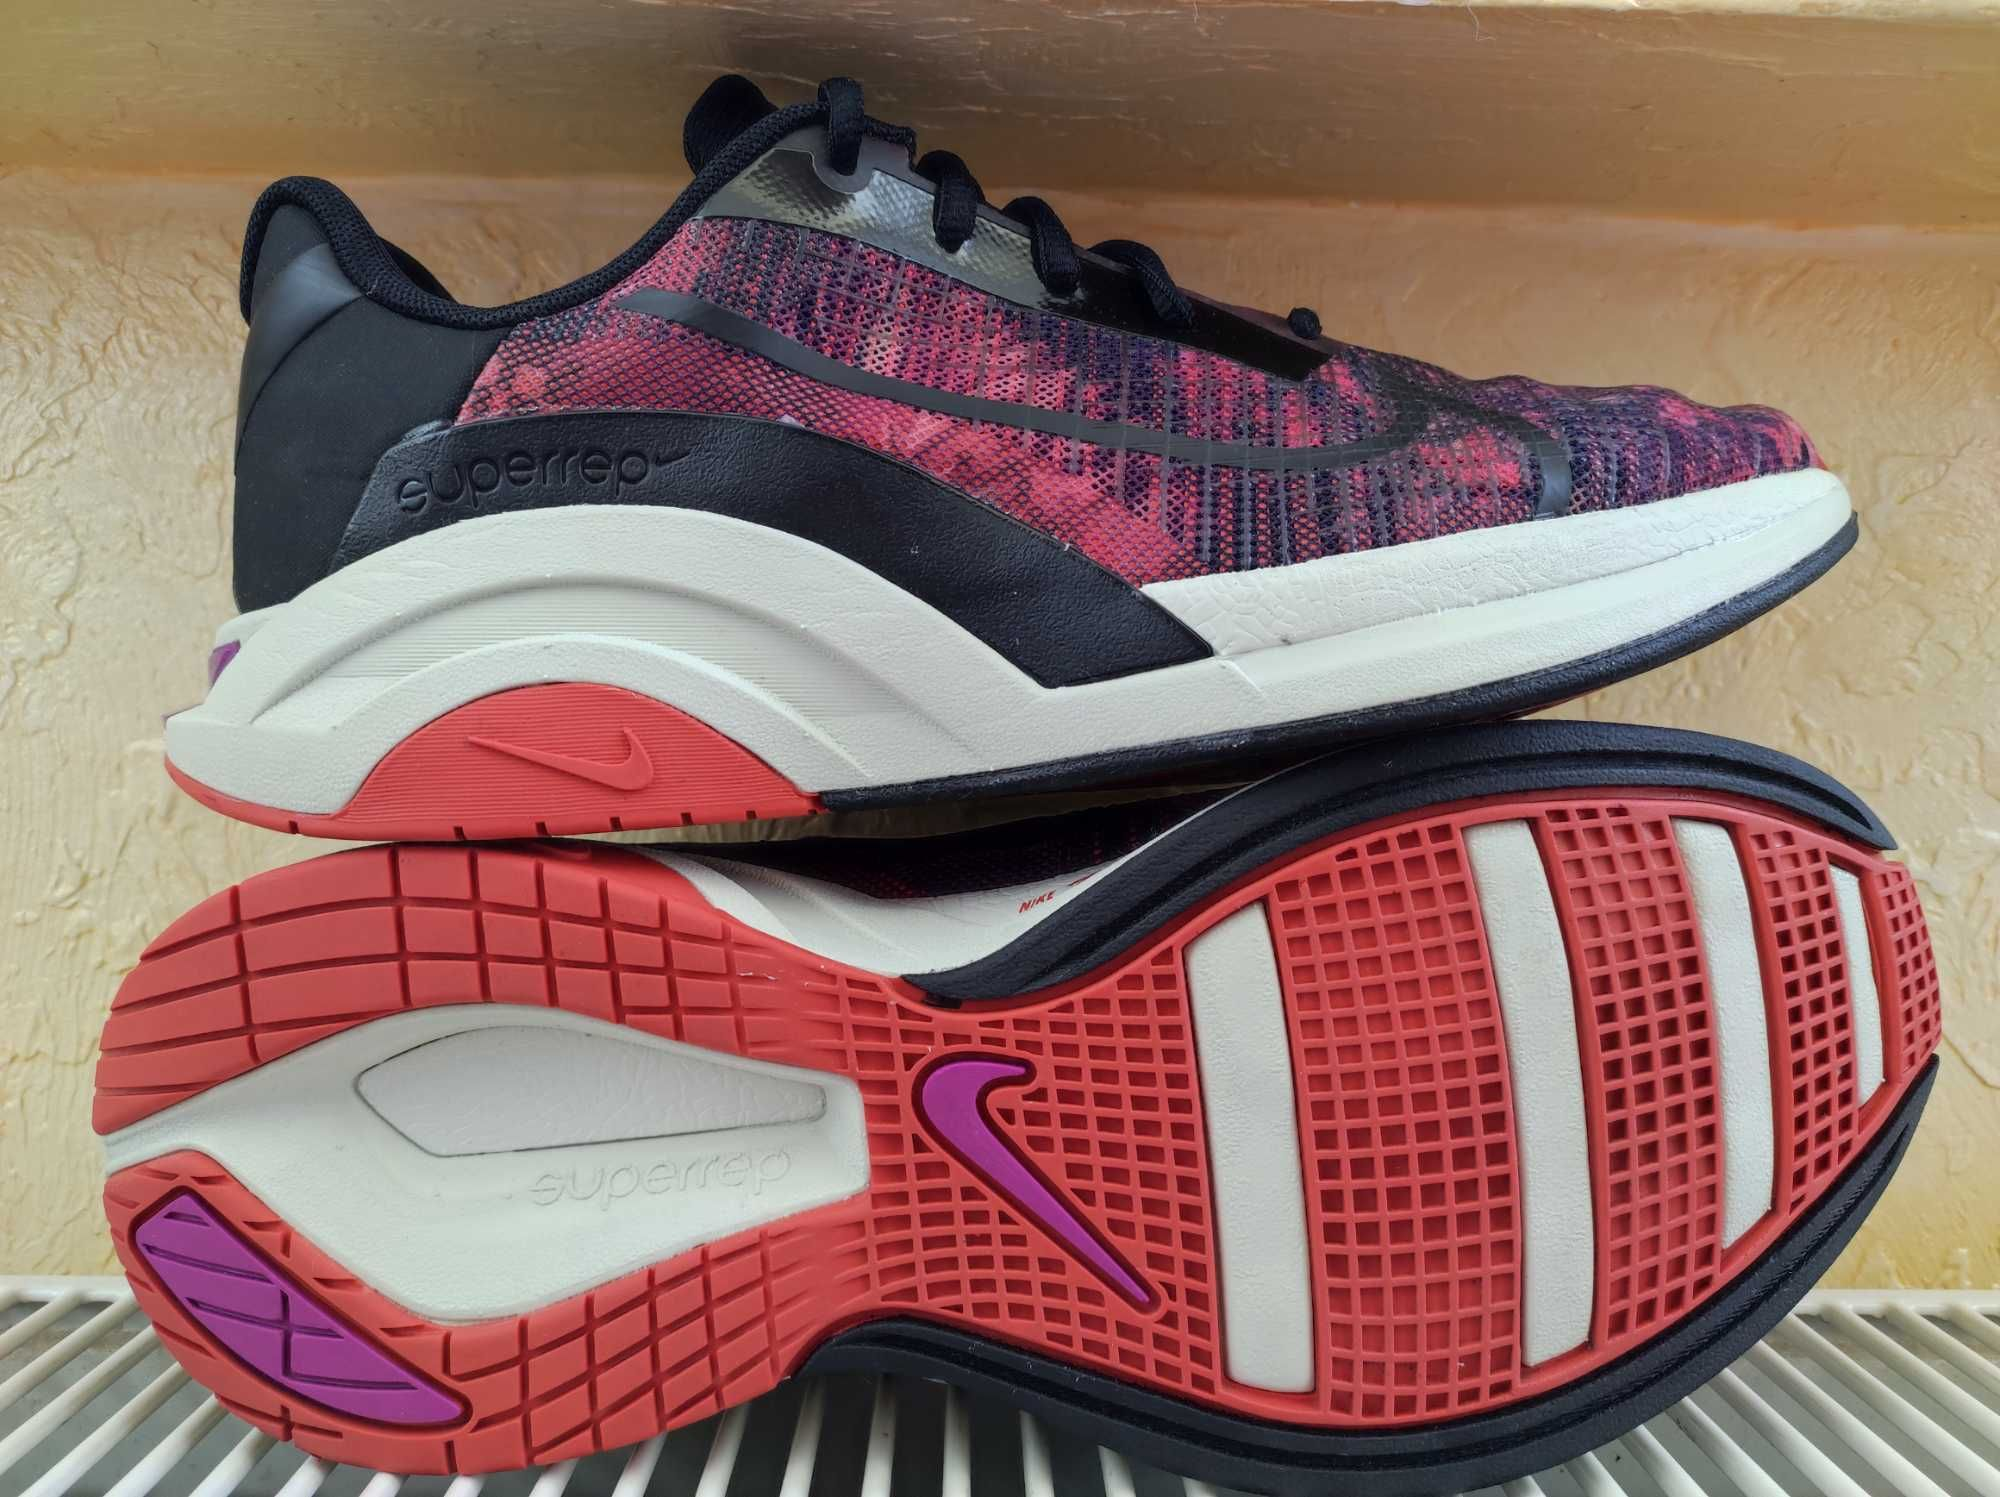 ОРИГІНАЛ100%!Кроссовки Nike ZoomX SuperRep Surge Endurance CU7627-003